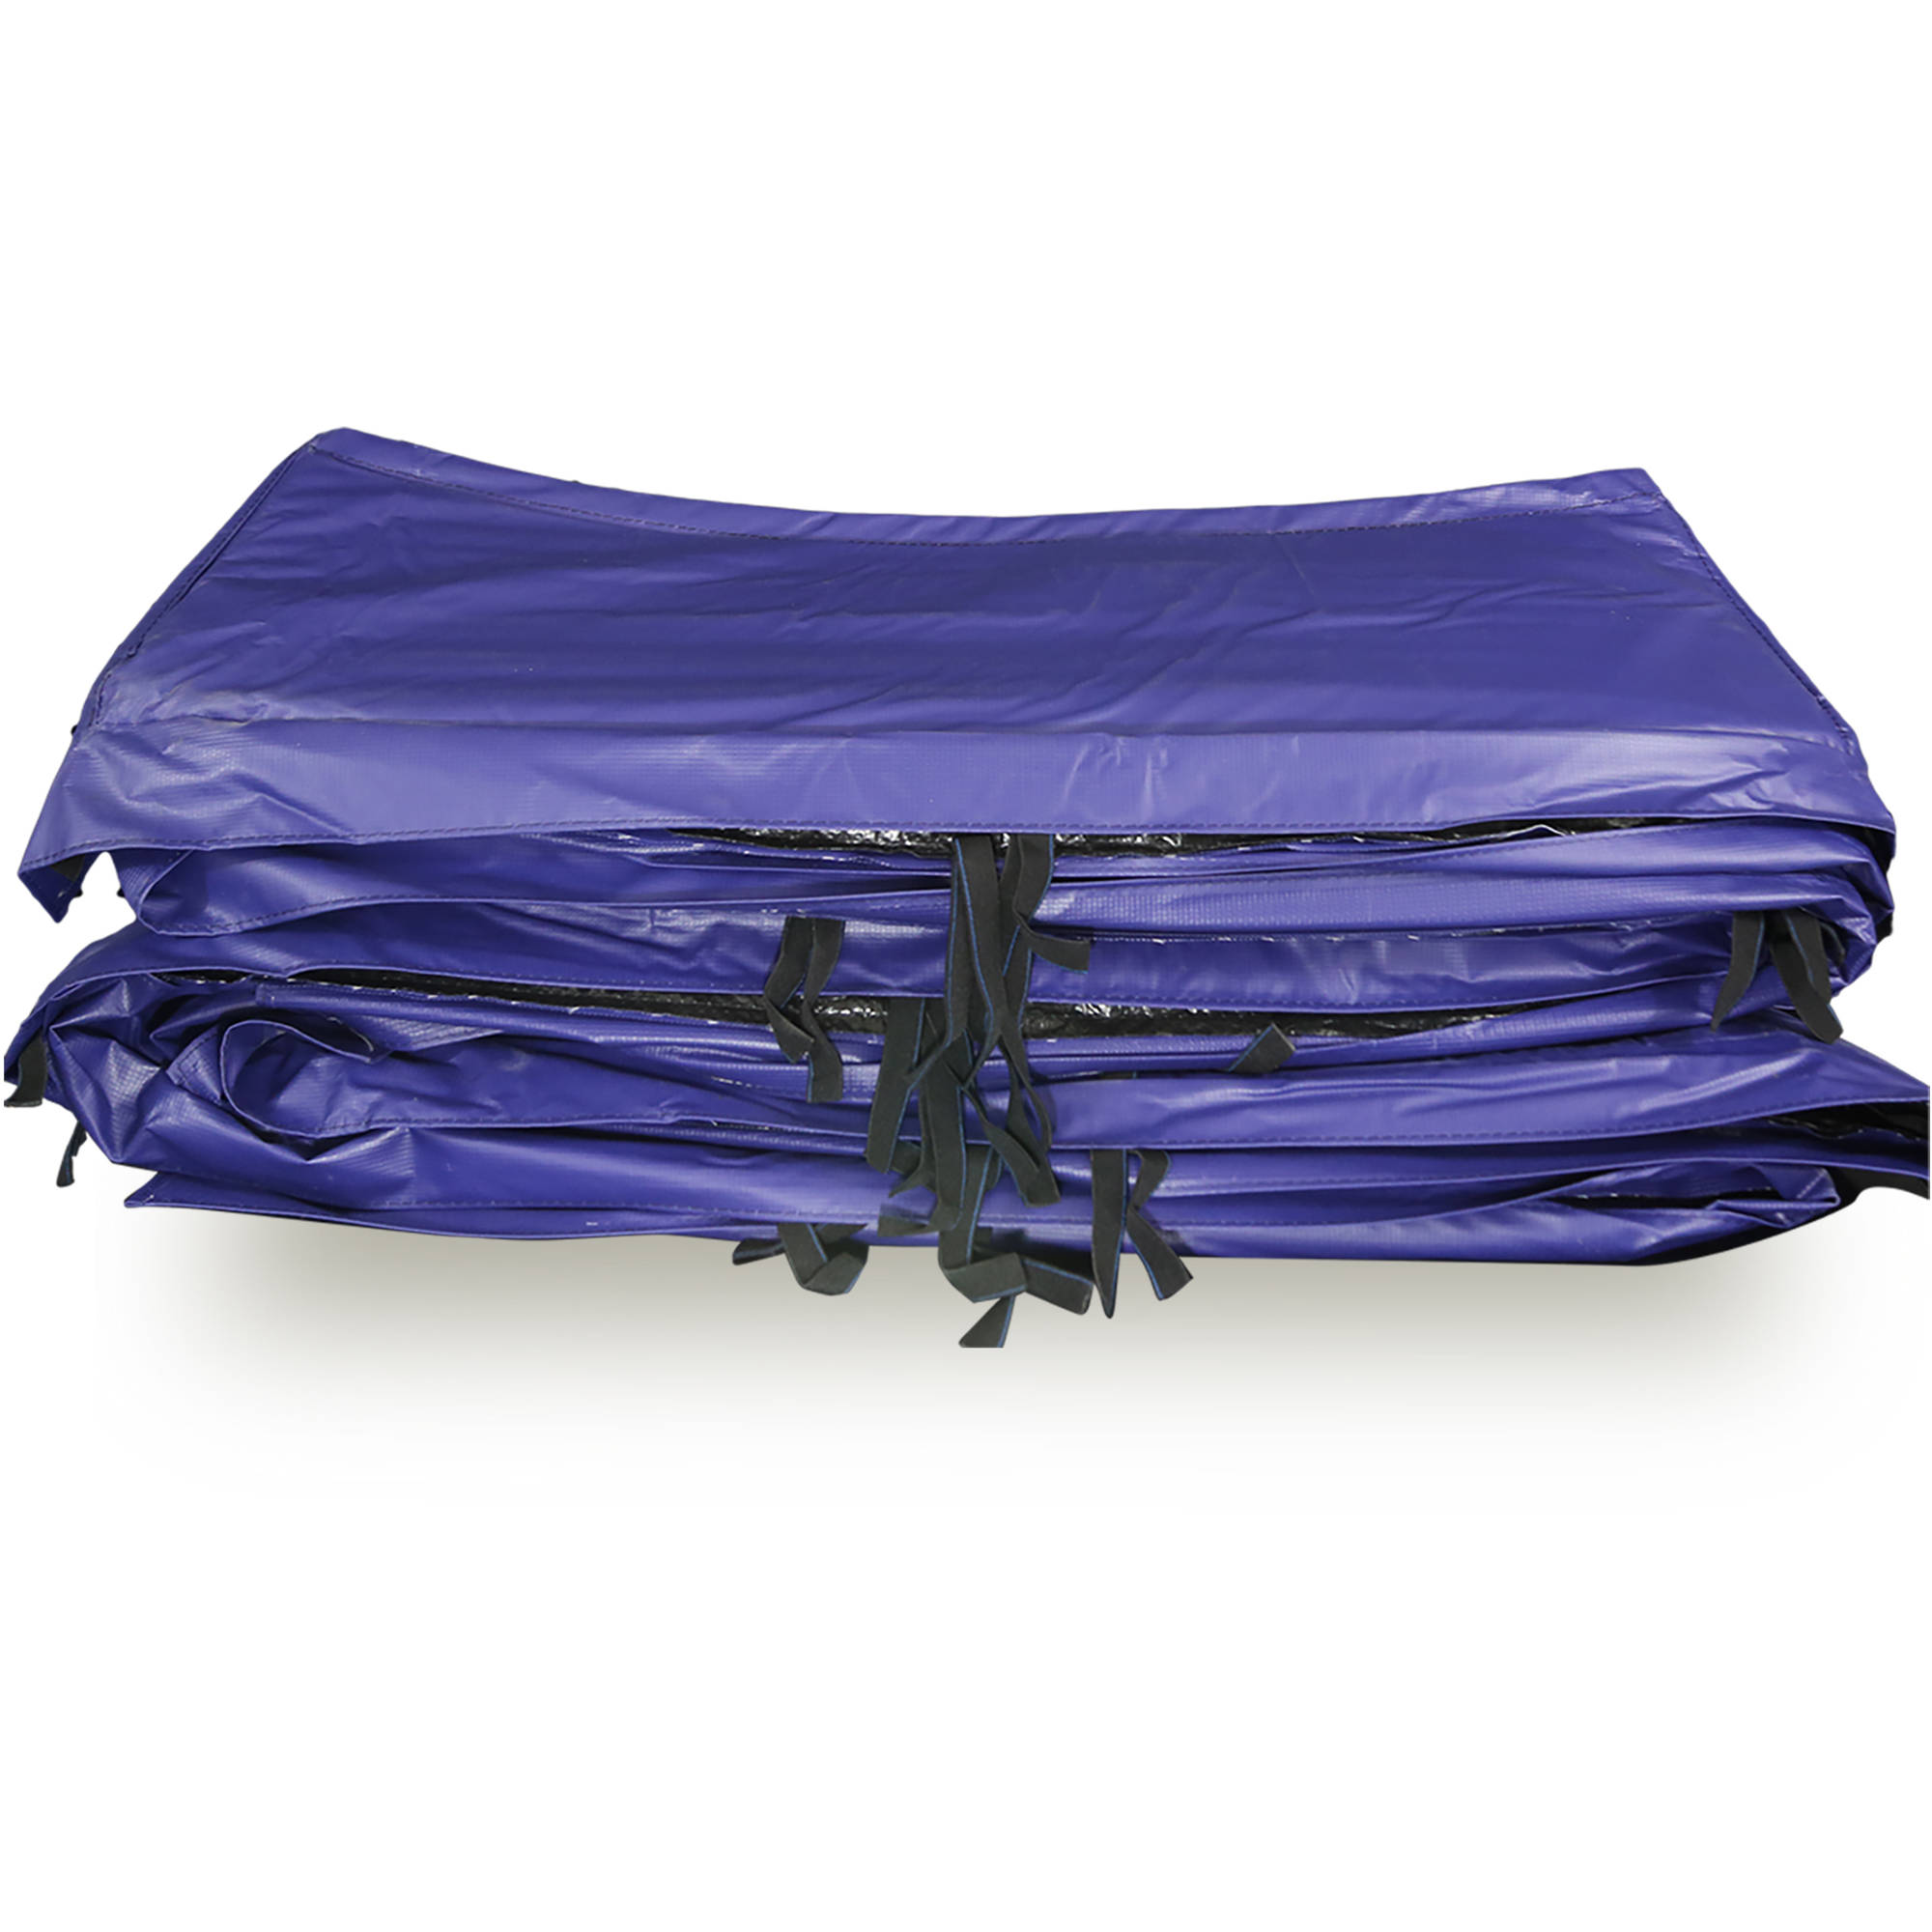 Skywalker Trampolines 12-Foot Round PVC Spring Pad, Blue